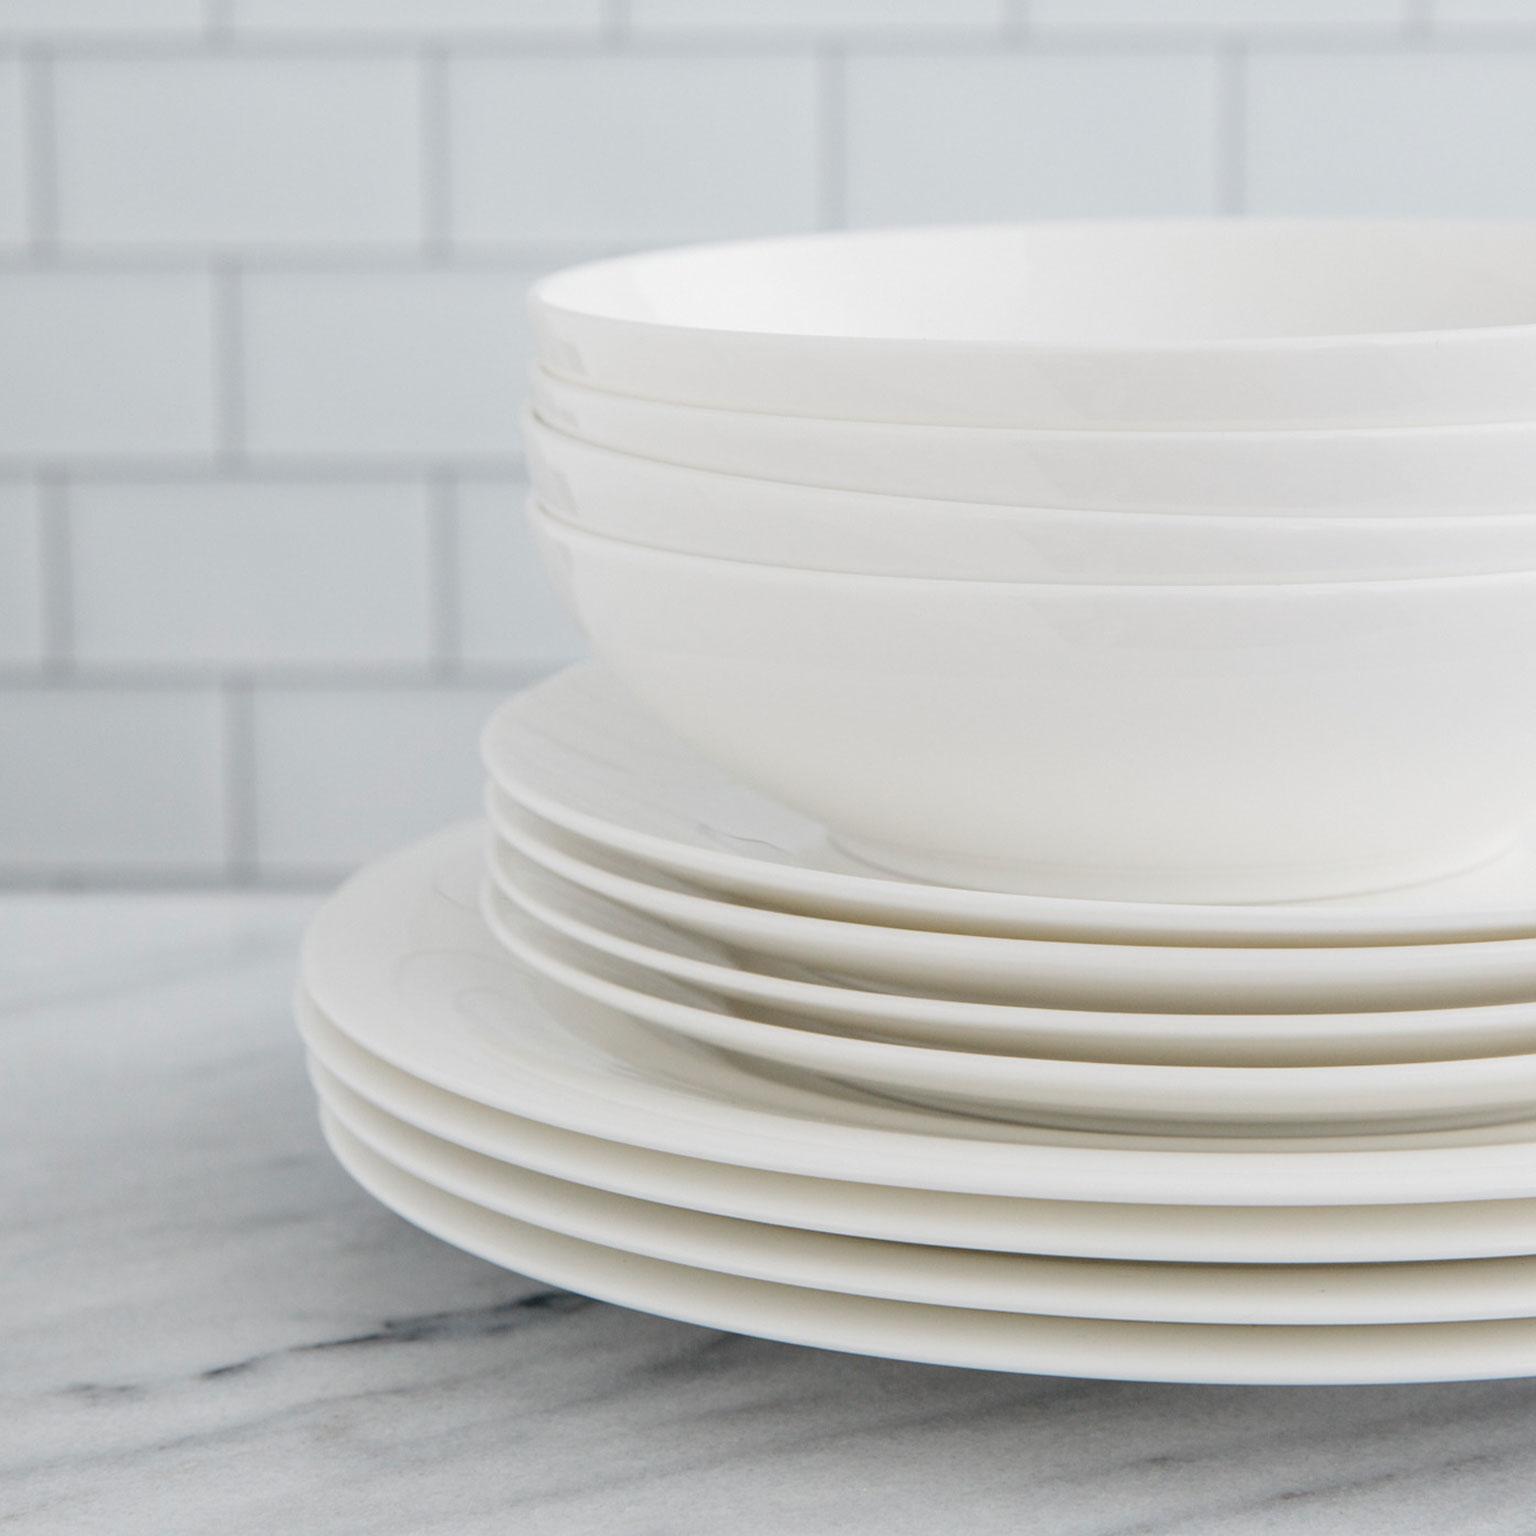 White dinnerware sets  sc 1 st  Amazon.com & Amazon.com: Dining \u0026 Entertaining: Home \u0026 Kitchen: Glassware ...